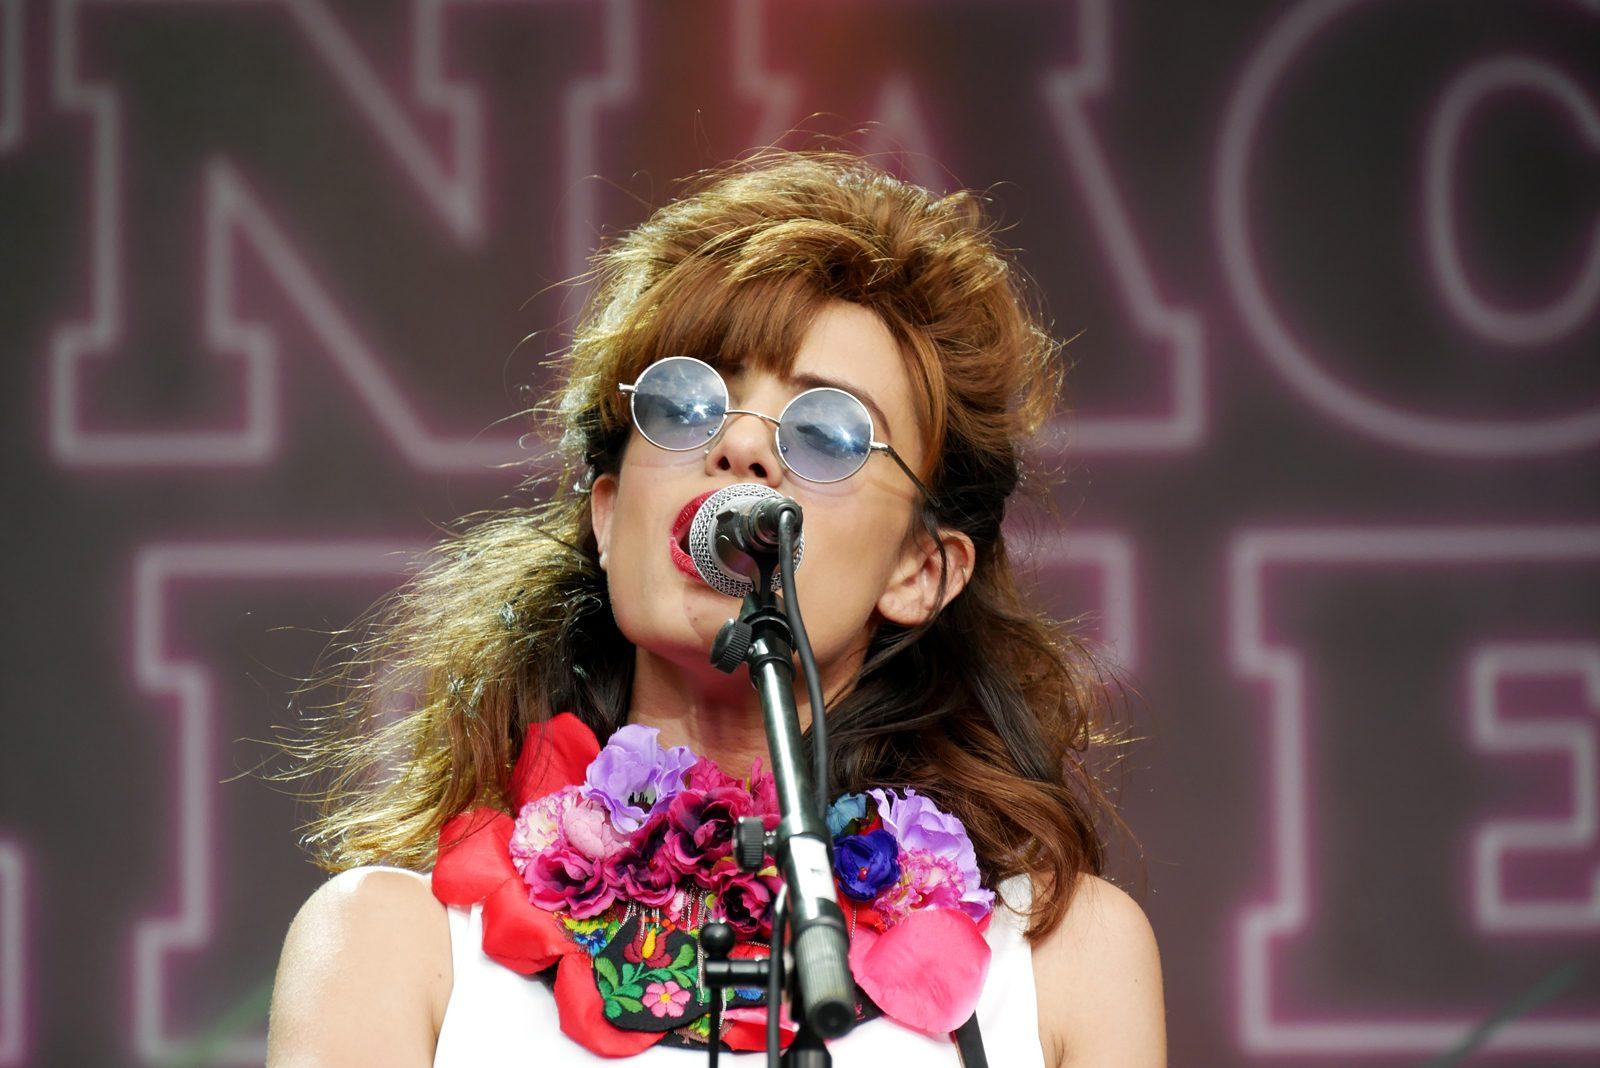 lola marsh Yael Shoshana Cohen Fnac Live 2016 Report concert mercredi 20 juillet musique photo by blog united states of paris